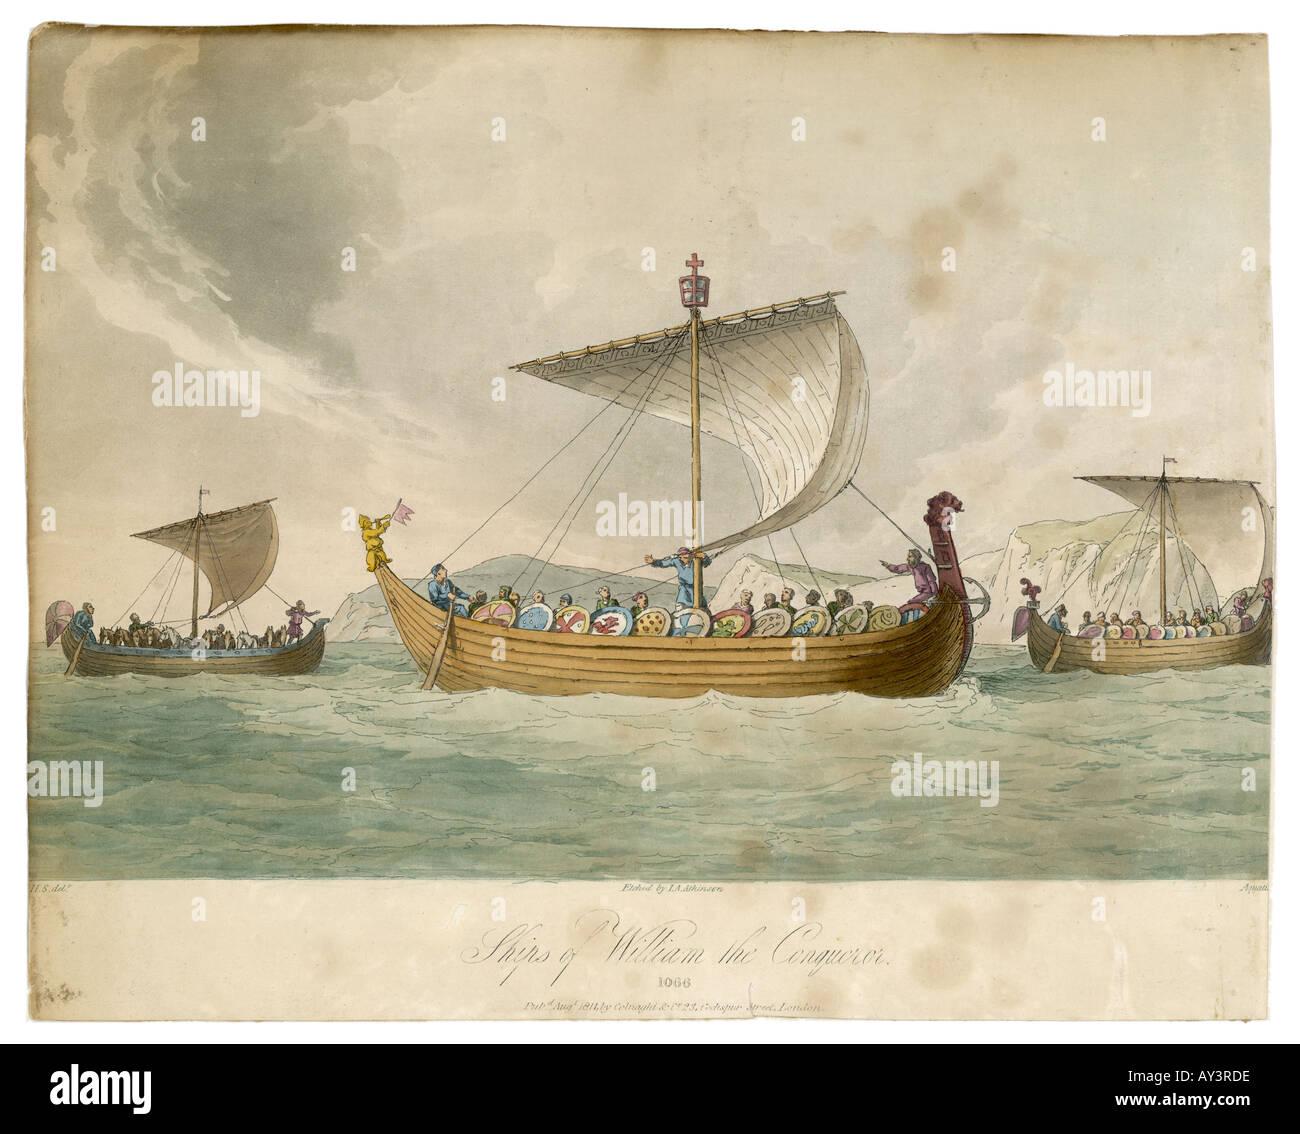 William Conqueror Ships - Stock Image